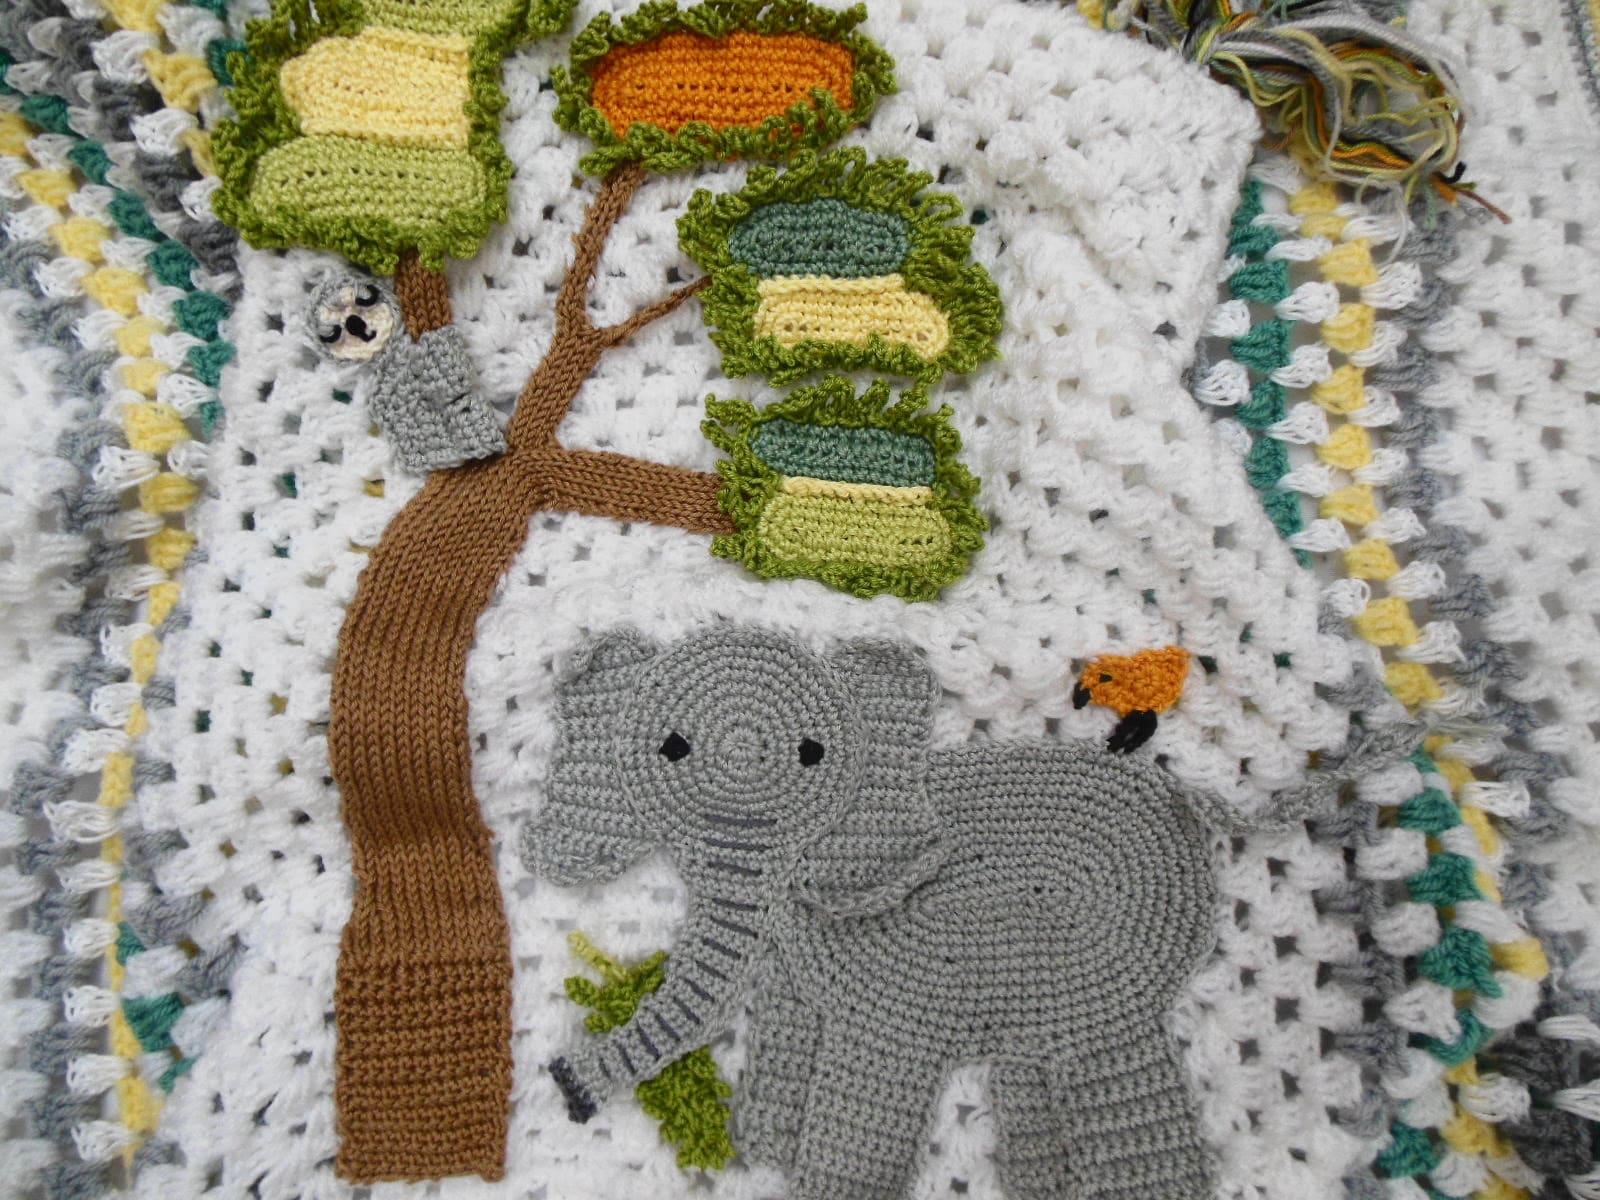 Crochet elephant blanket, pattern by Ira Rott - Album on Imgur | 1200x1600